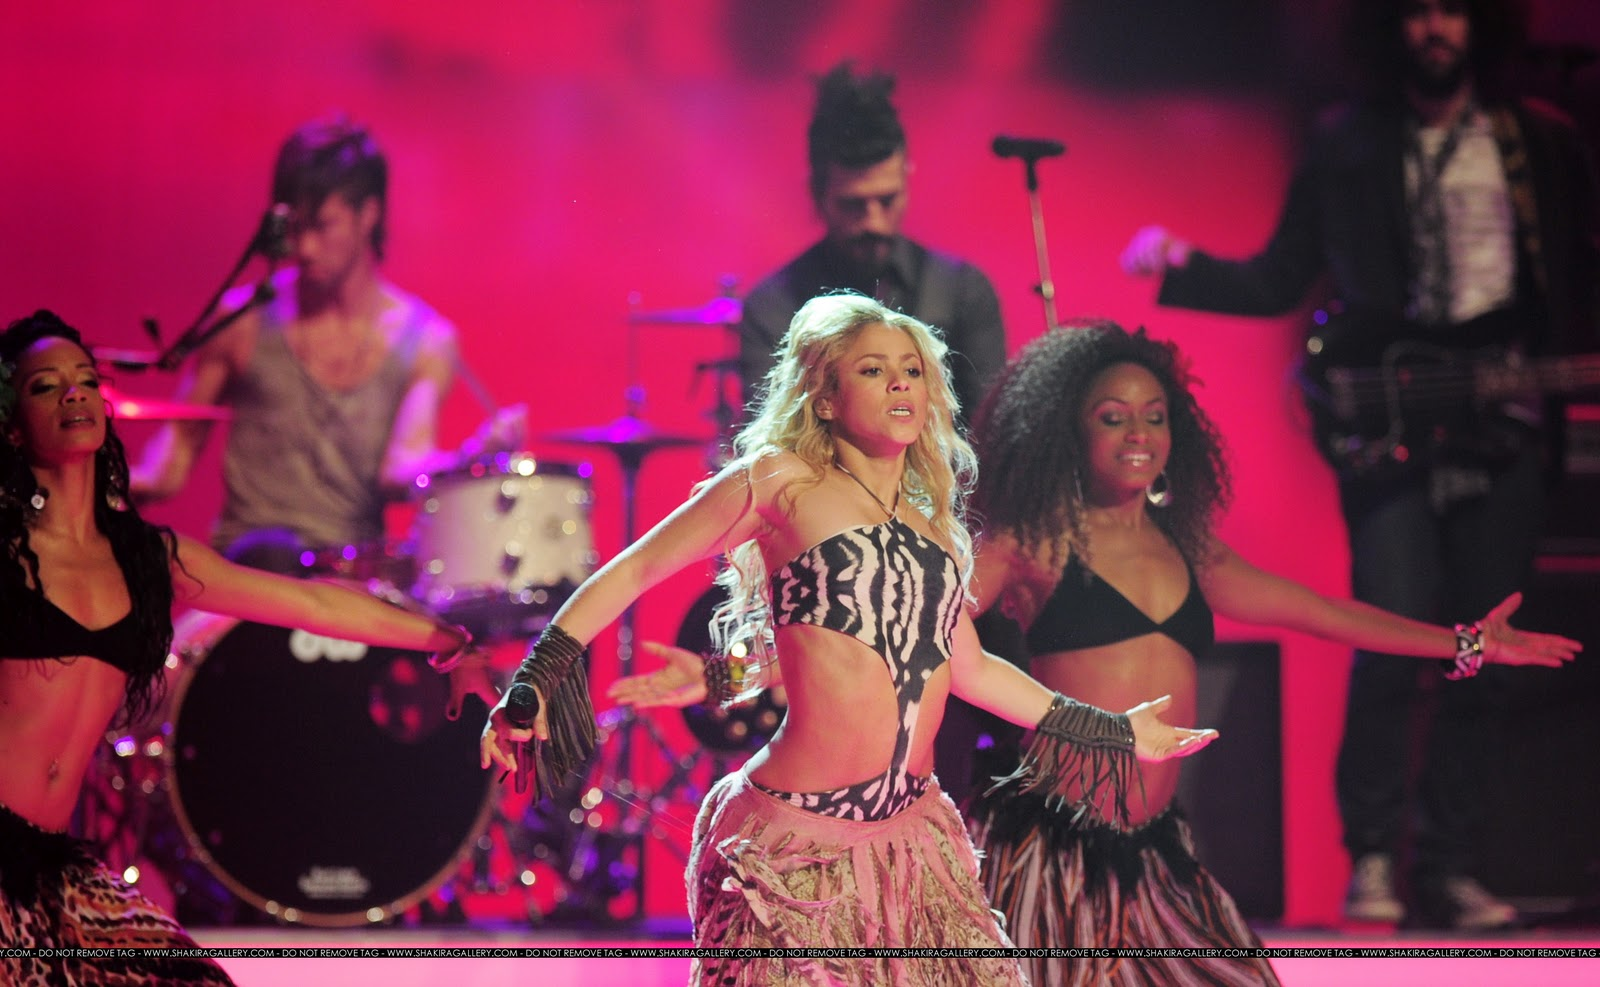 Шакира вака вака, Shakira - Waka Waka (FifaWorld Cup) - скачать 3 фотография